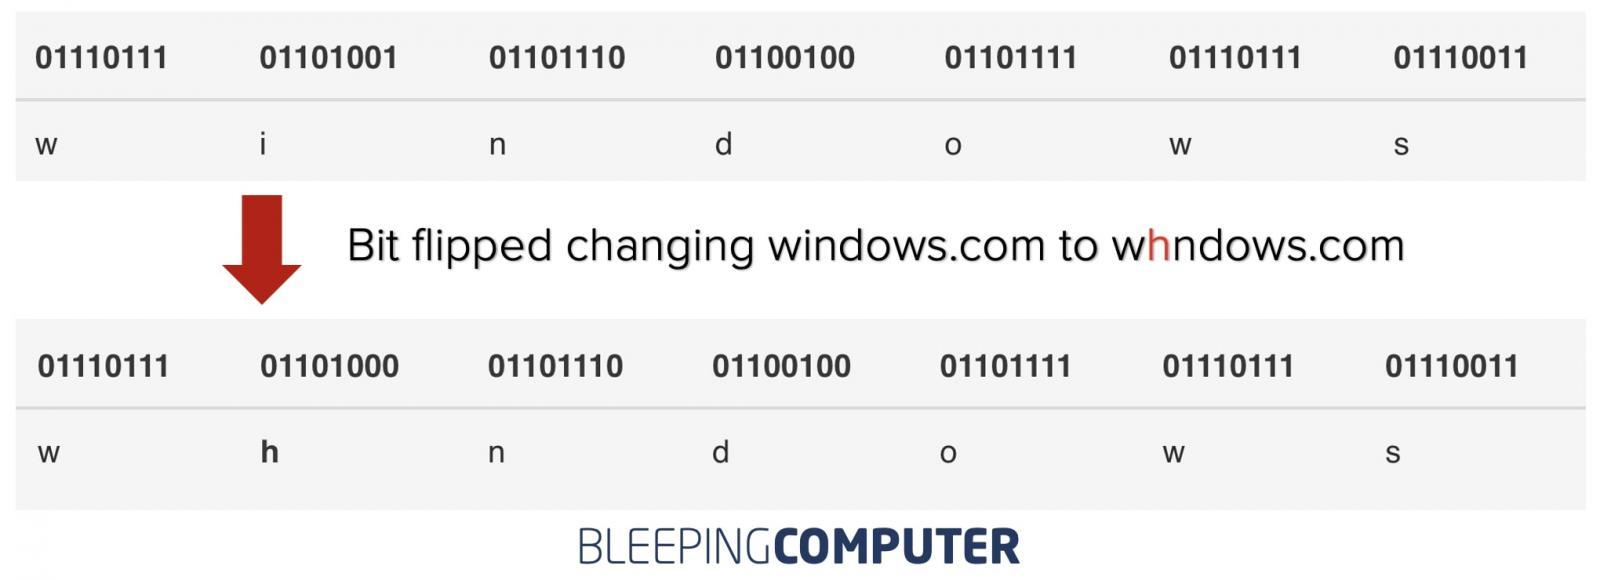 bitflipped windows.com domain